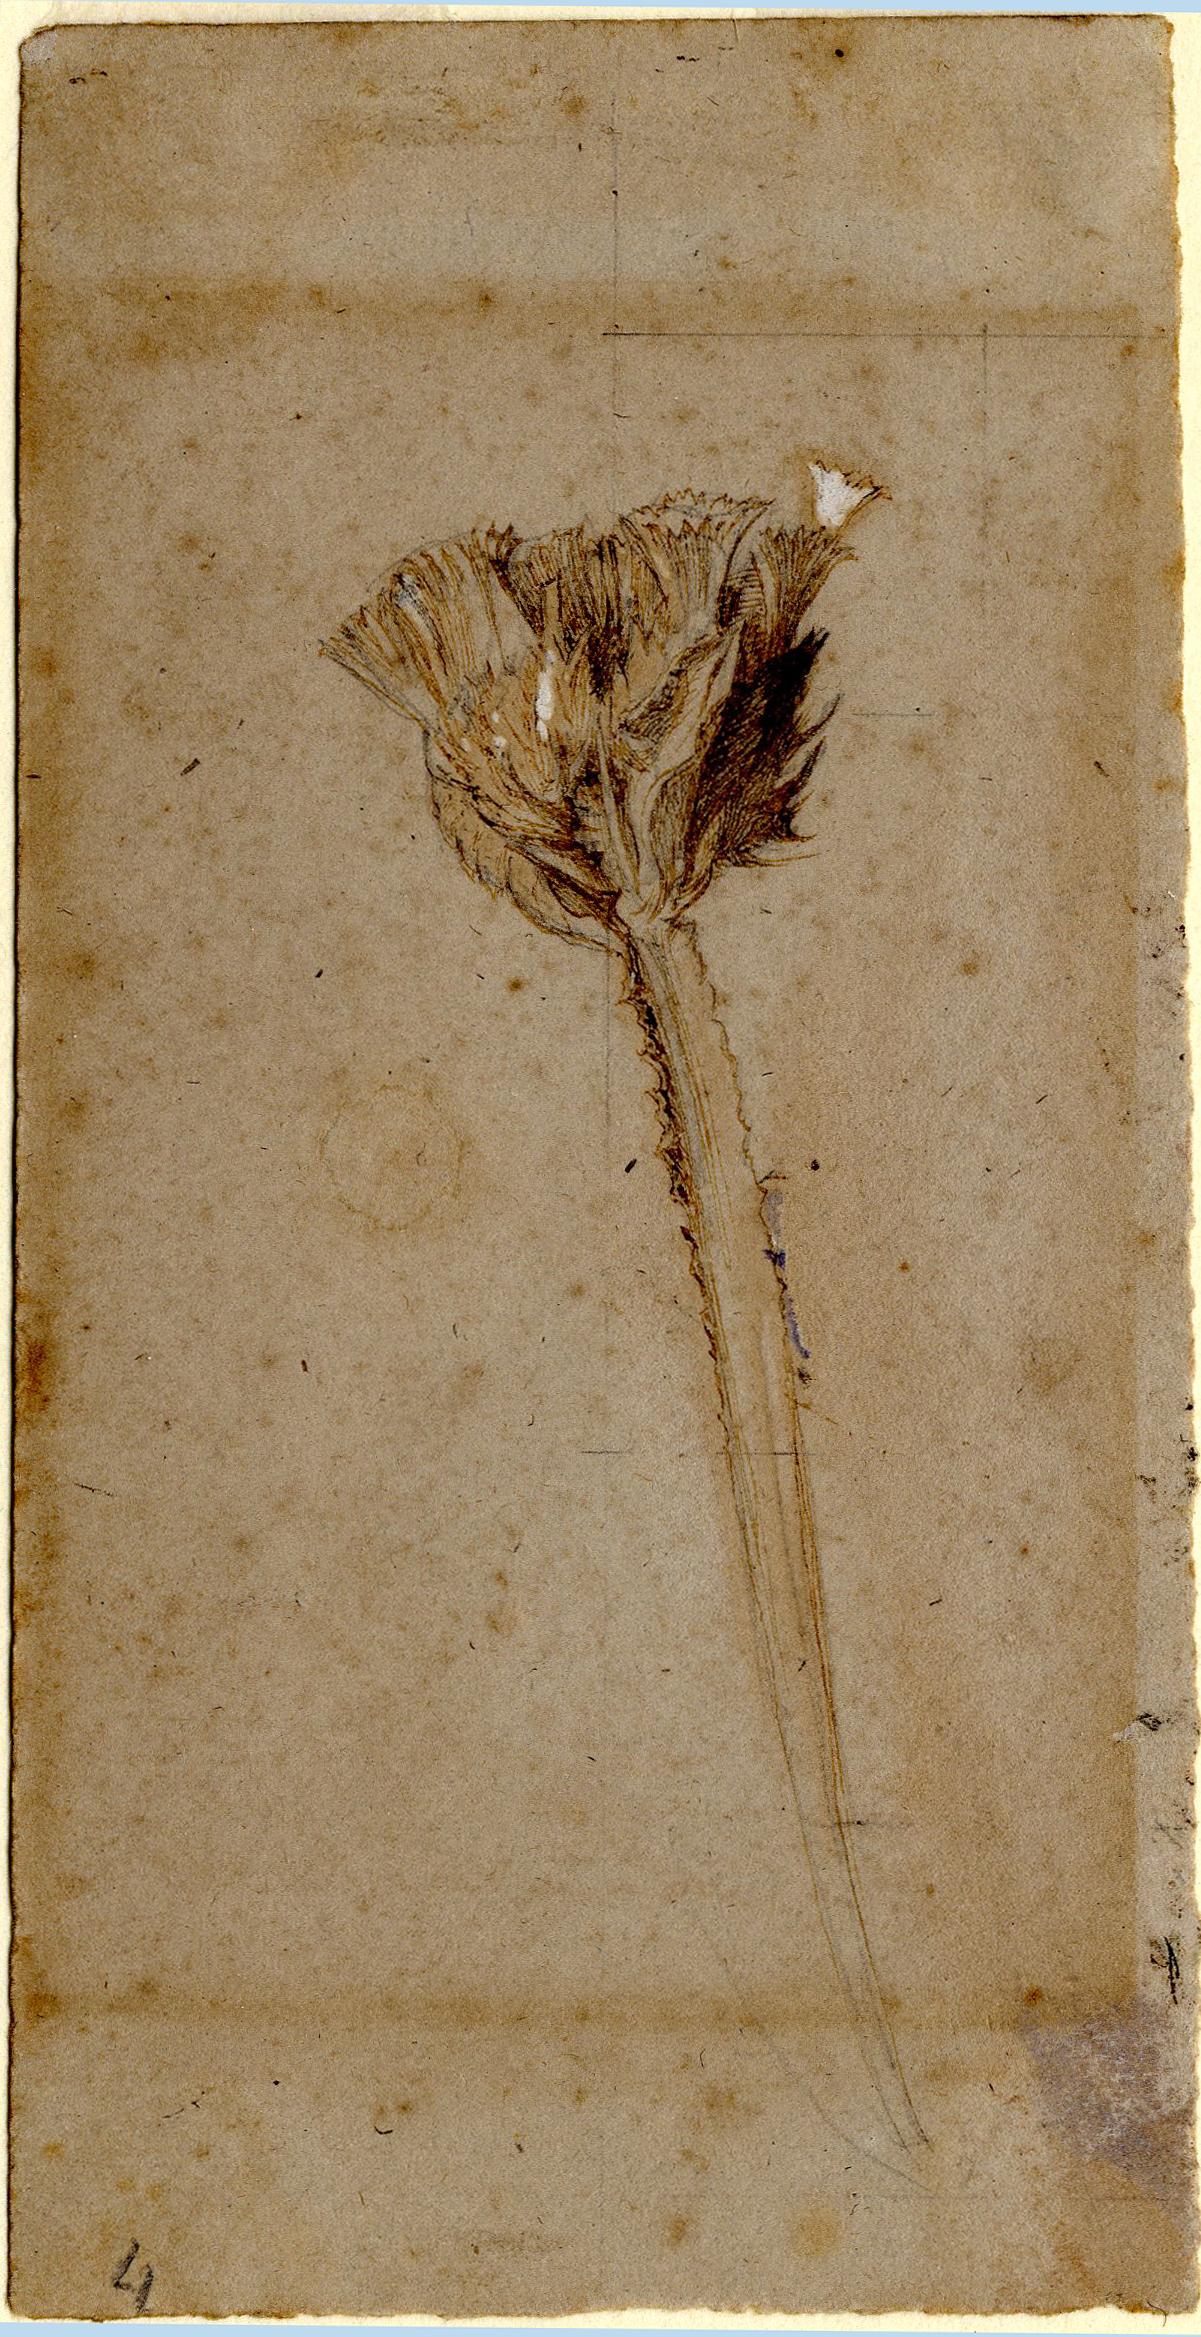 John Ruskin, Statice, RF1187 © Ruskin Foundation